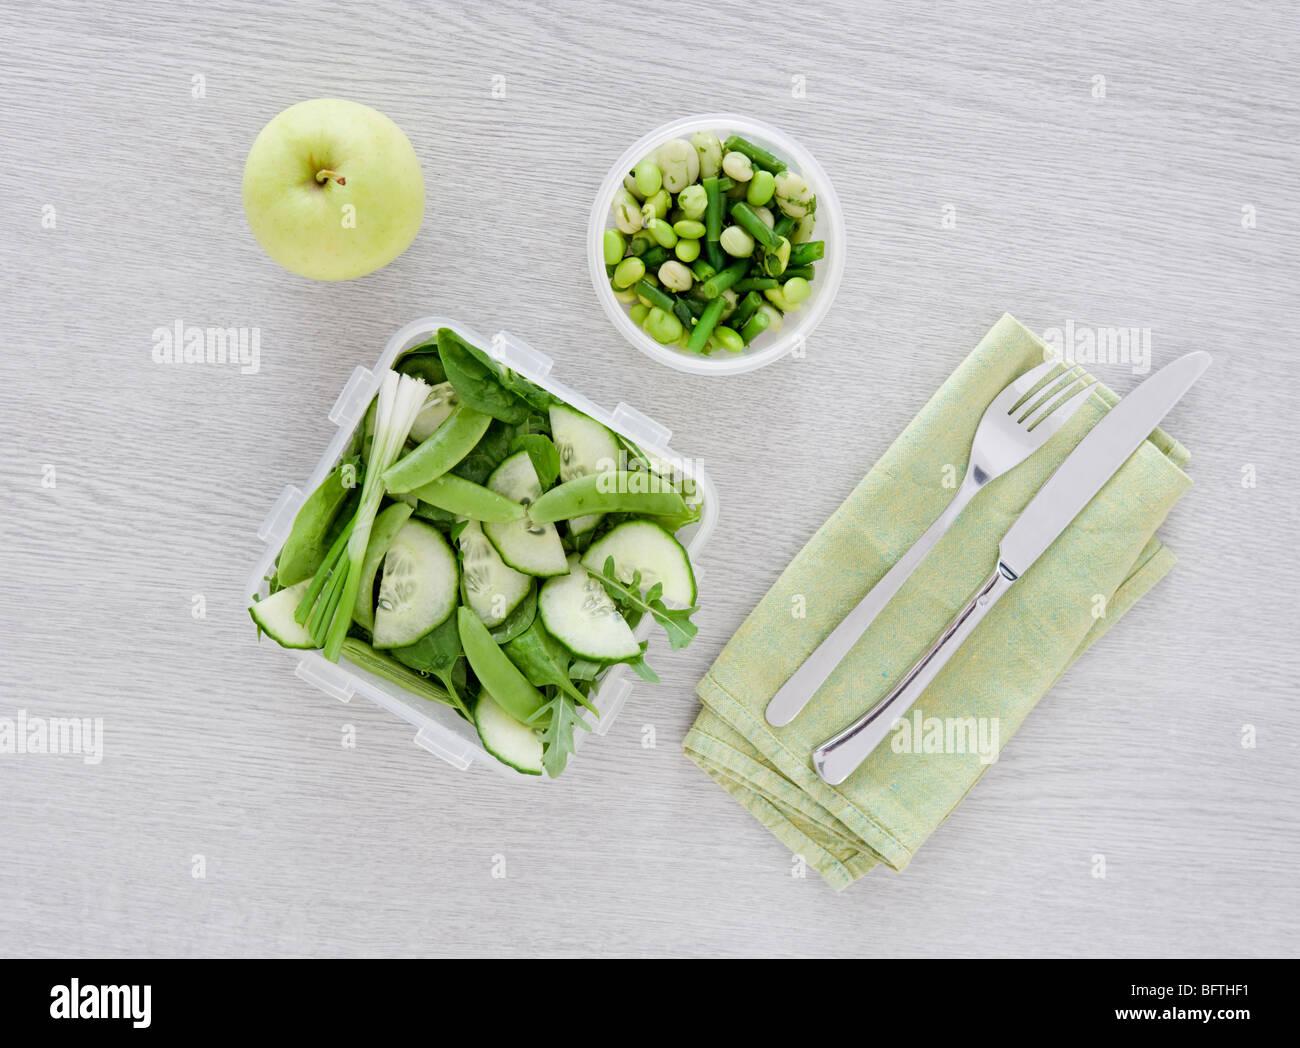 salad on desk - Stock Image